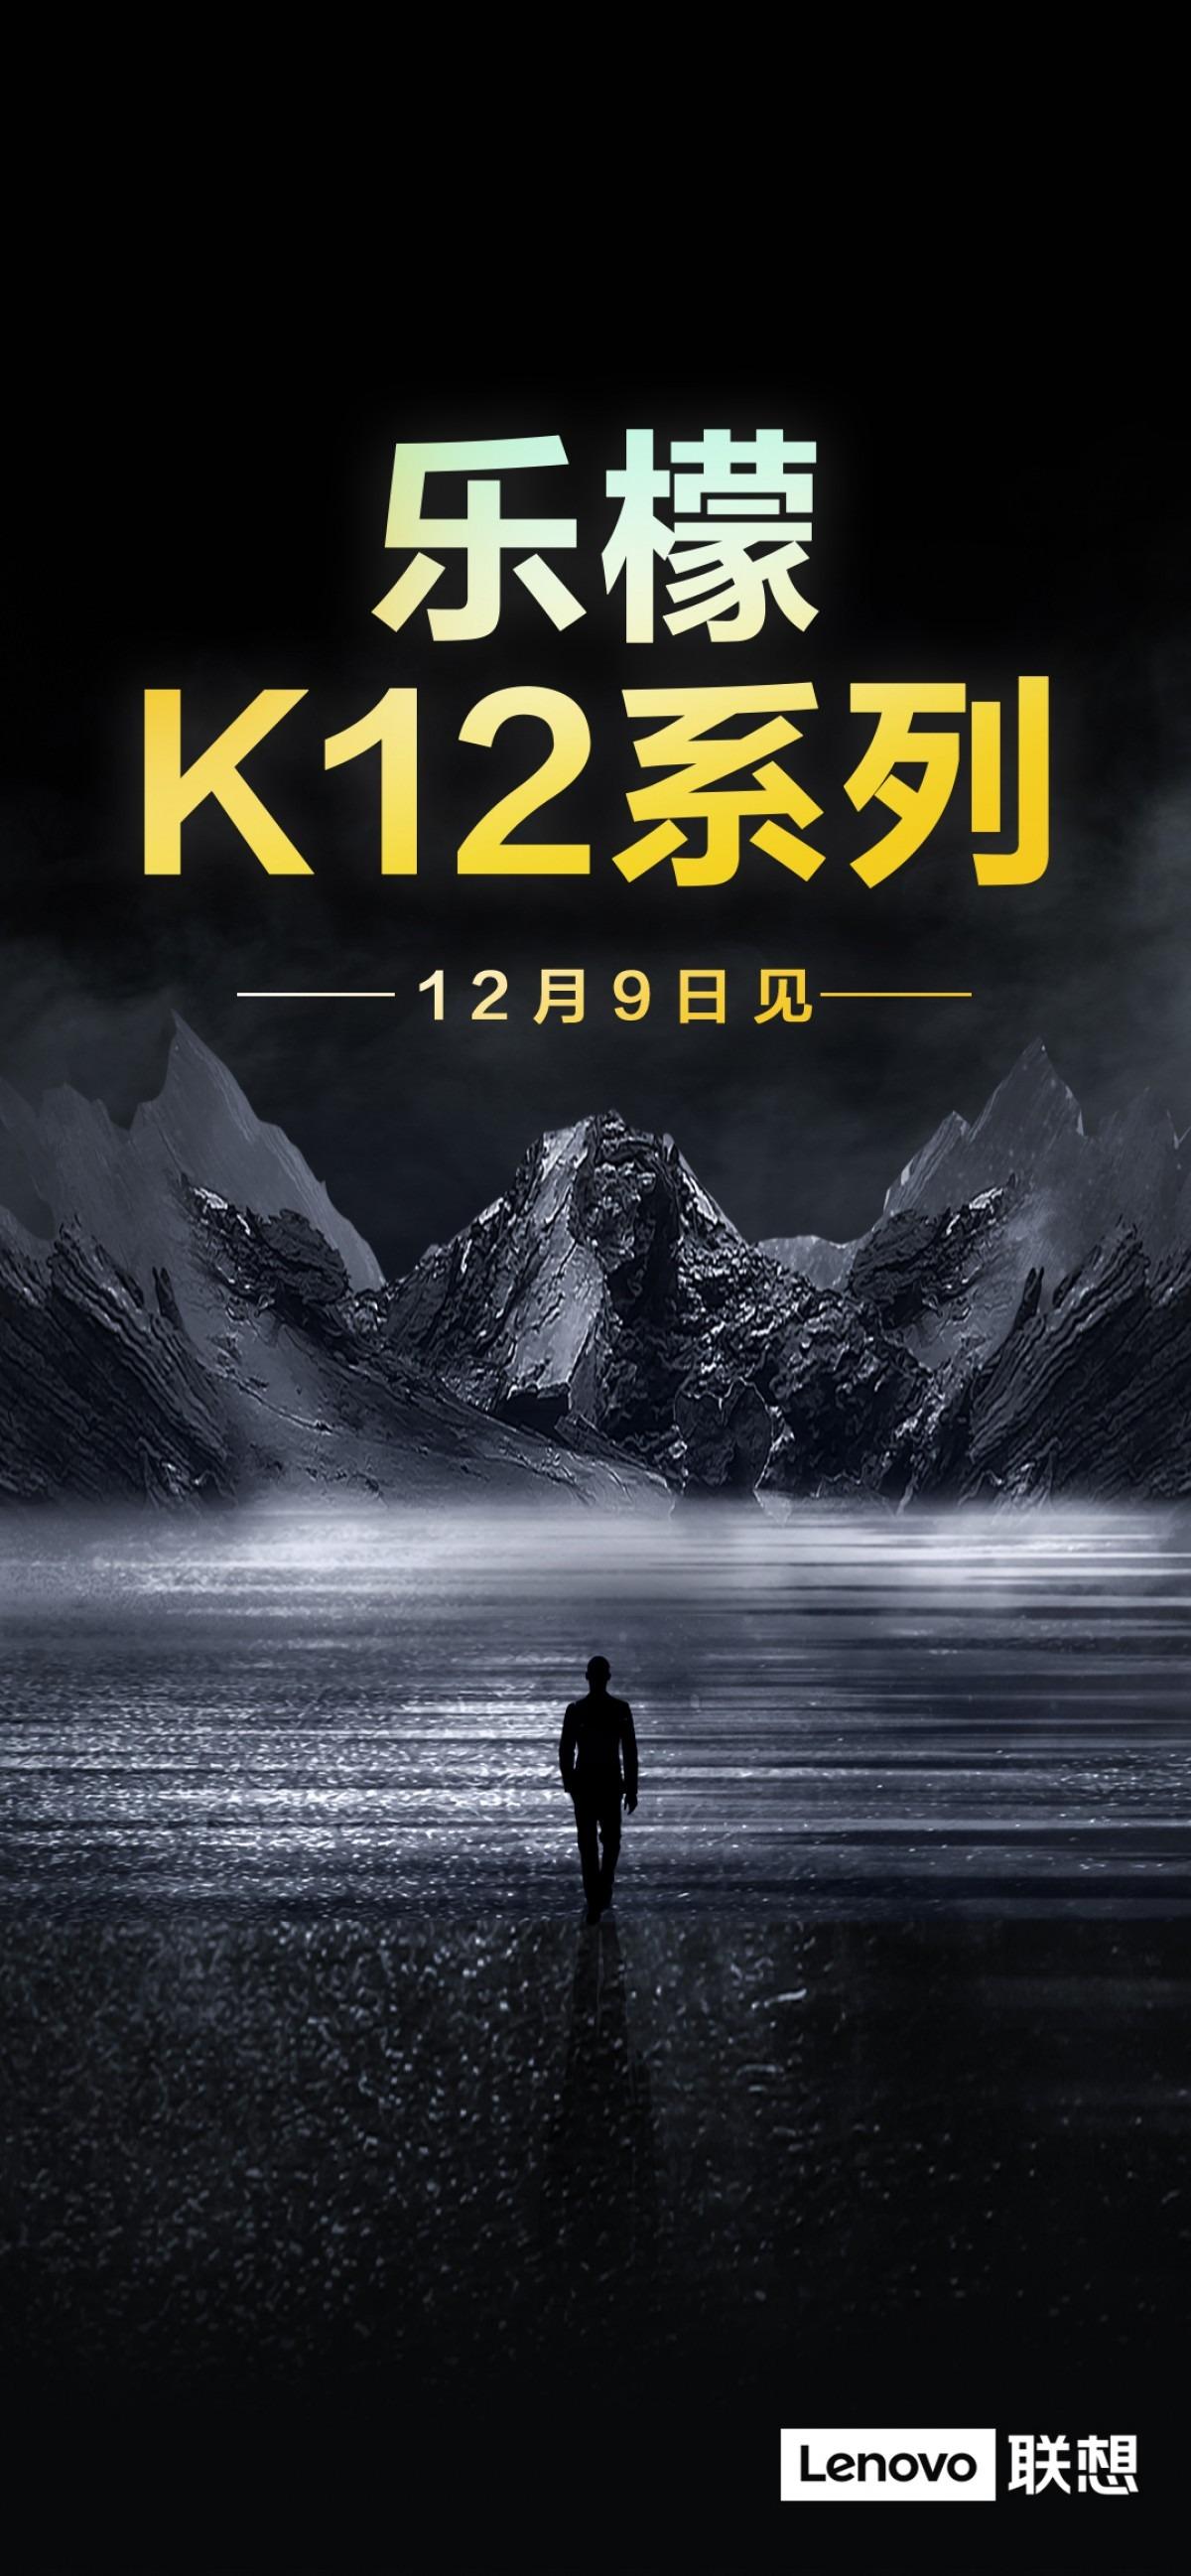 lenovo lemon k12